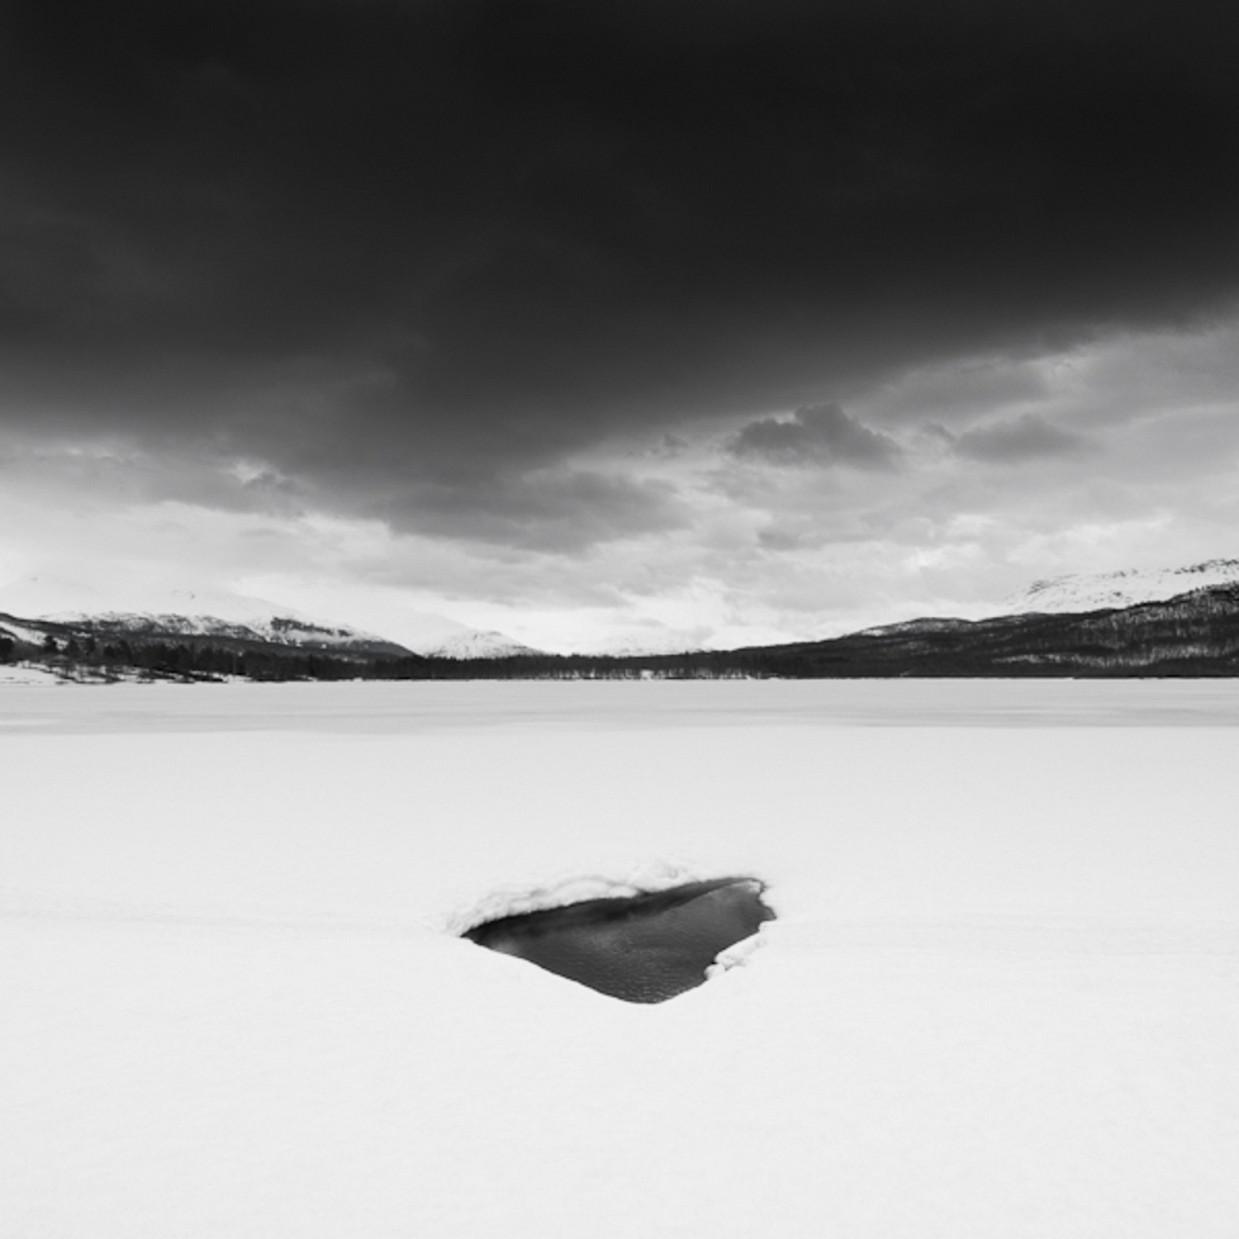 fotograf-Zoltan-Bekefi_20